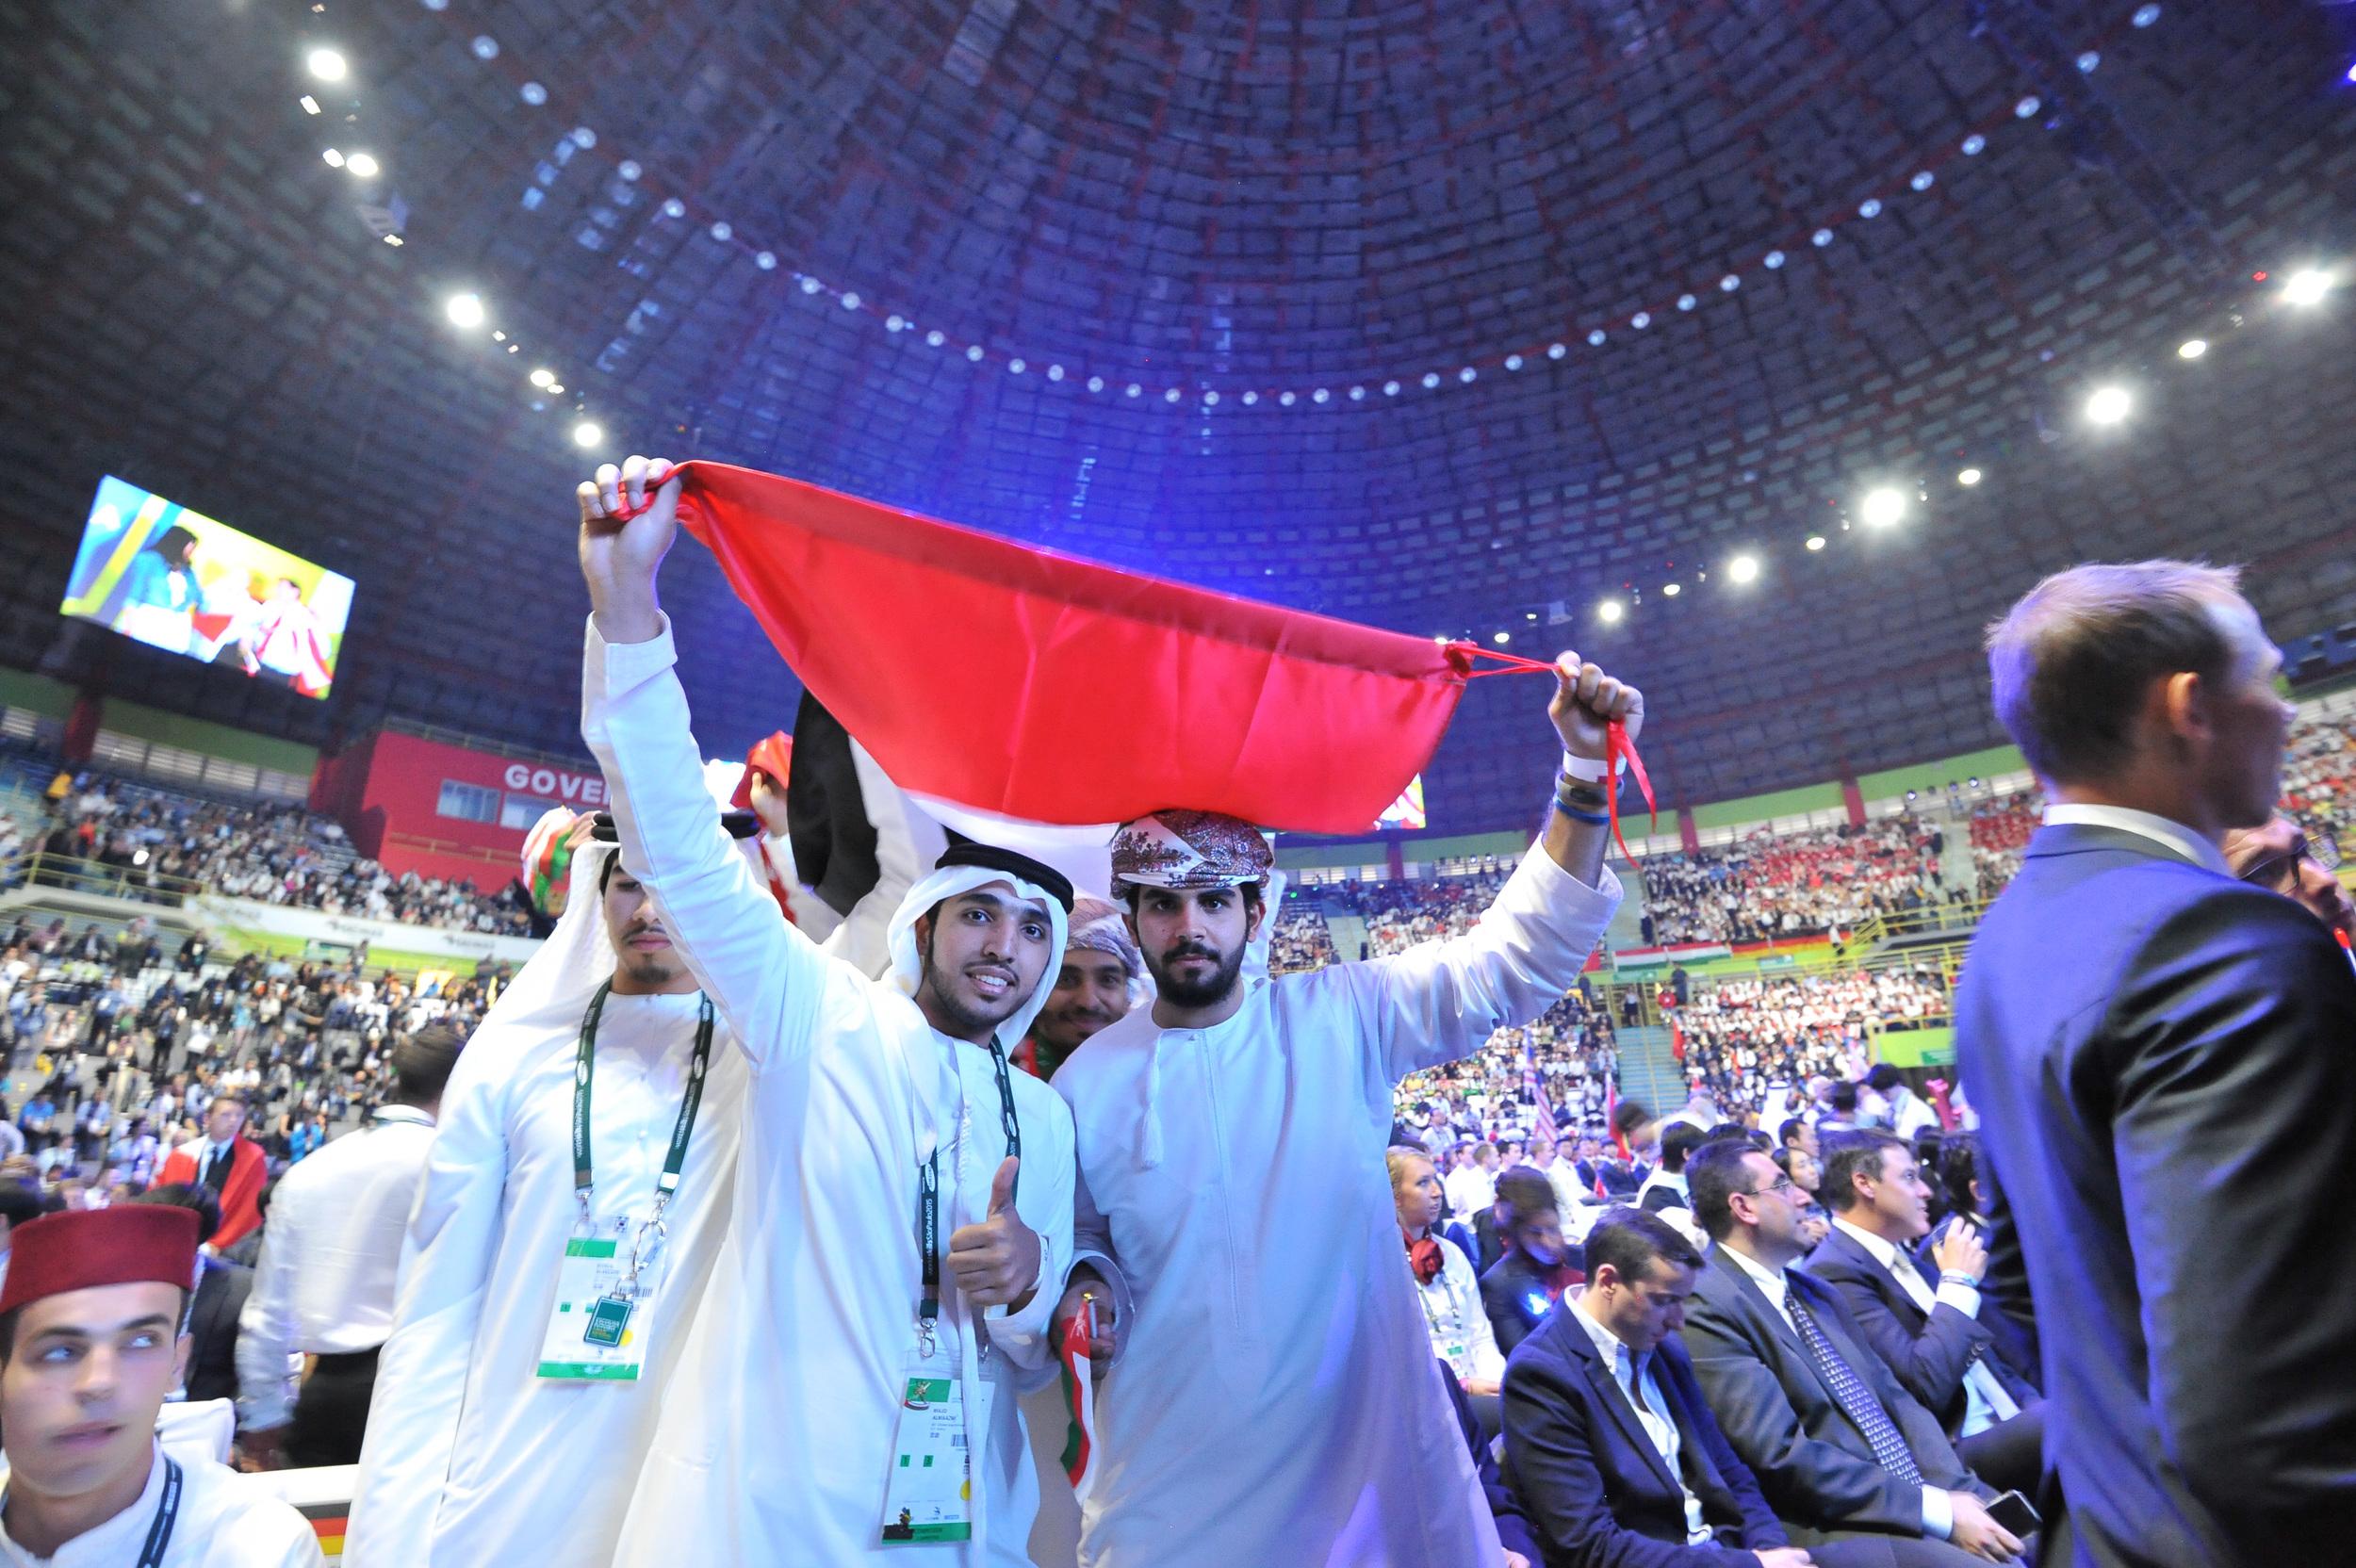 Emirati and Omani competitors at WorldSkills São Paulo closing ceremony (Photo credit: WorldSkills International)